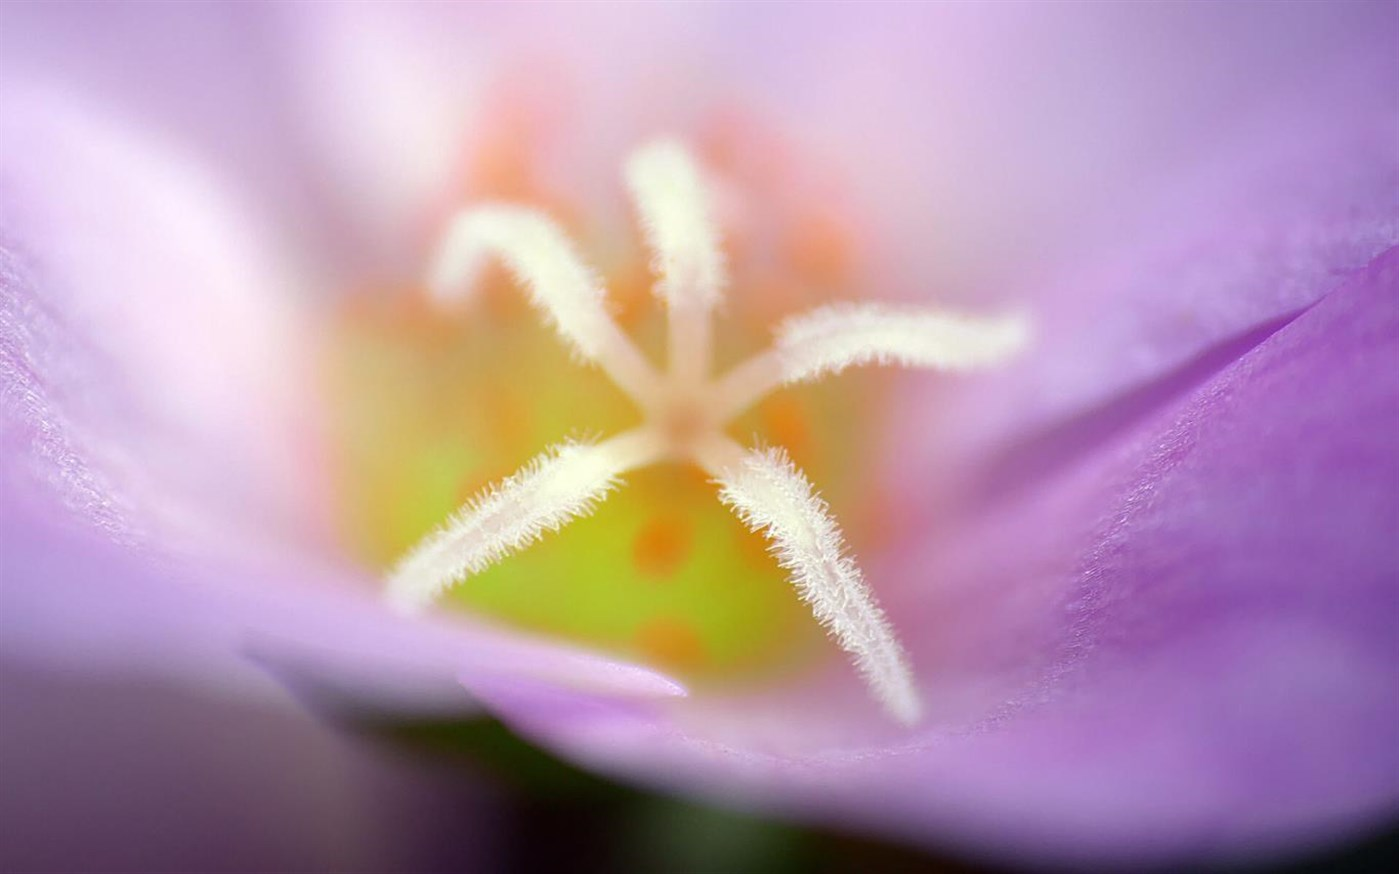 Windows 10 Theme: Download Microsoft's 'Flower Petals' theme pack 2